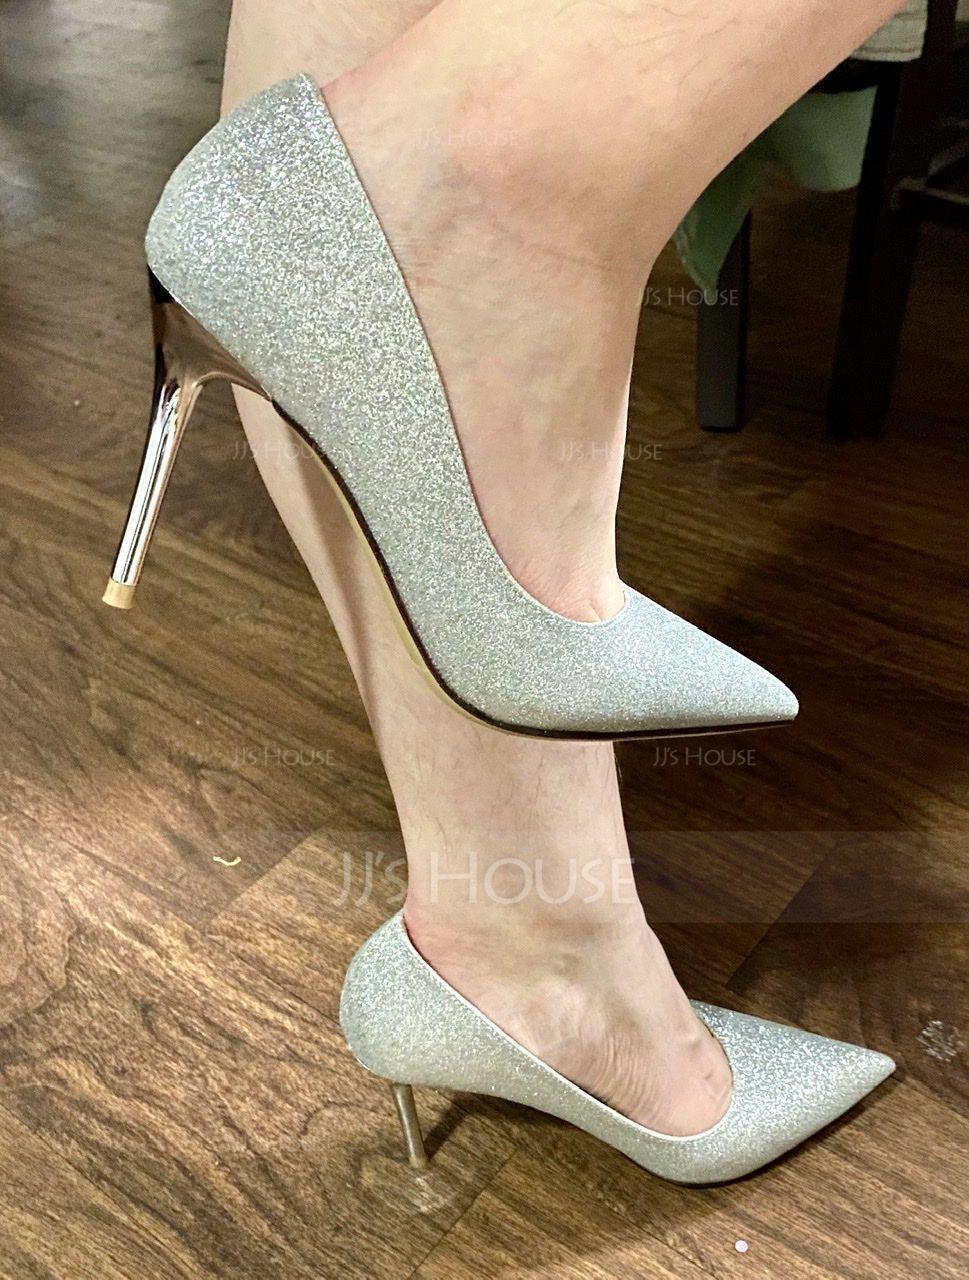 Women's Sparkling Glitter Stiletto Heel Pumps With Sparkling Glitter shoes (085115608)